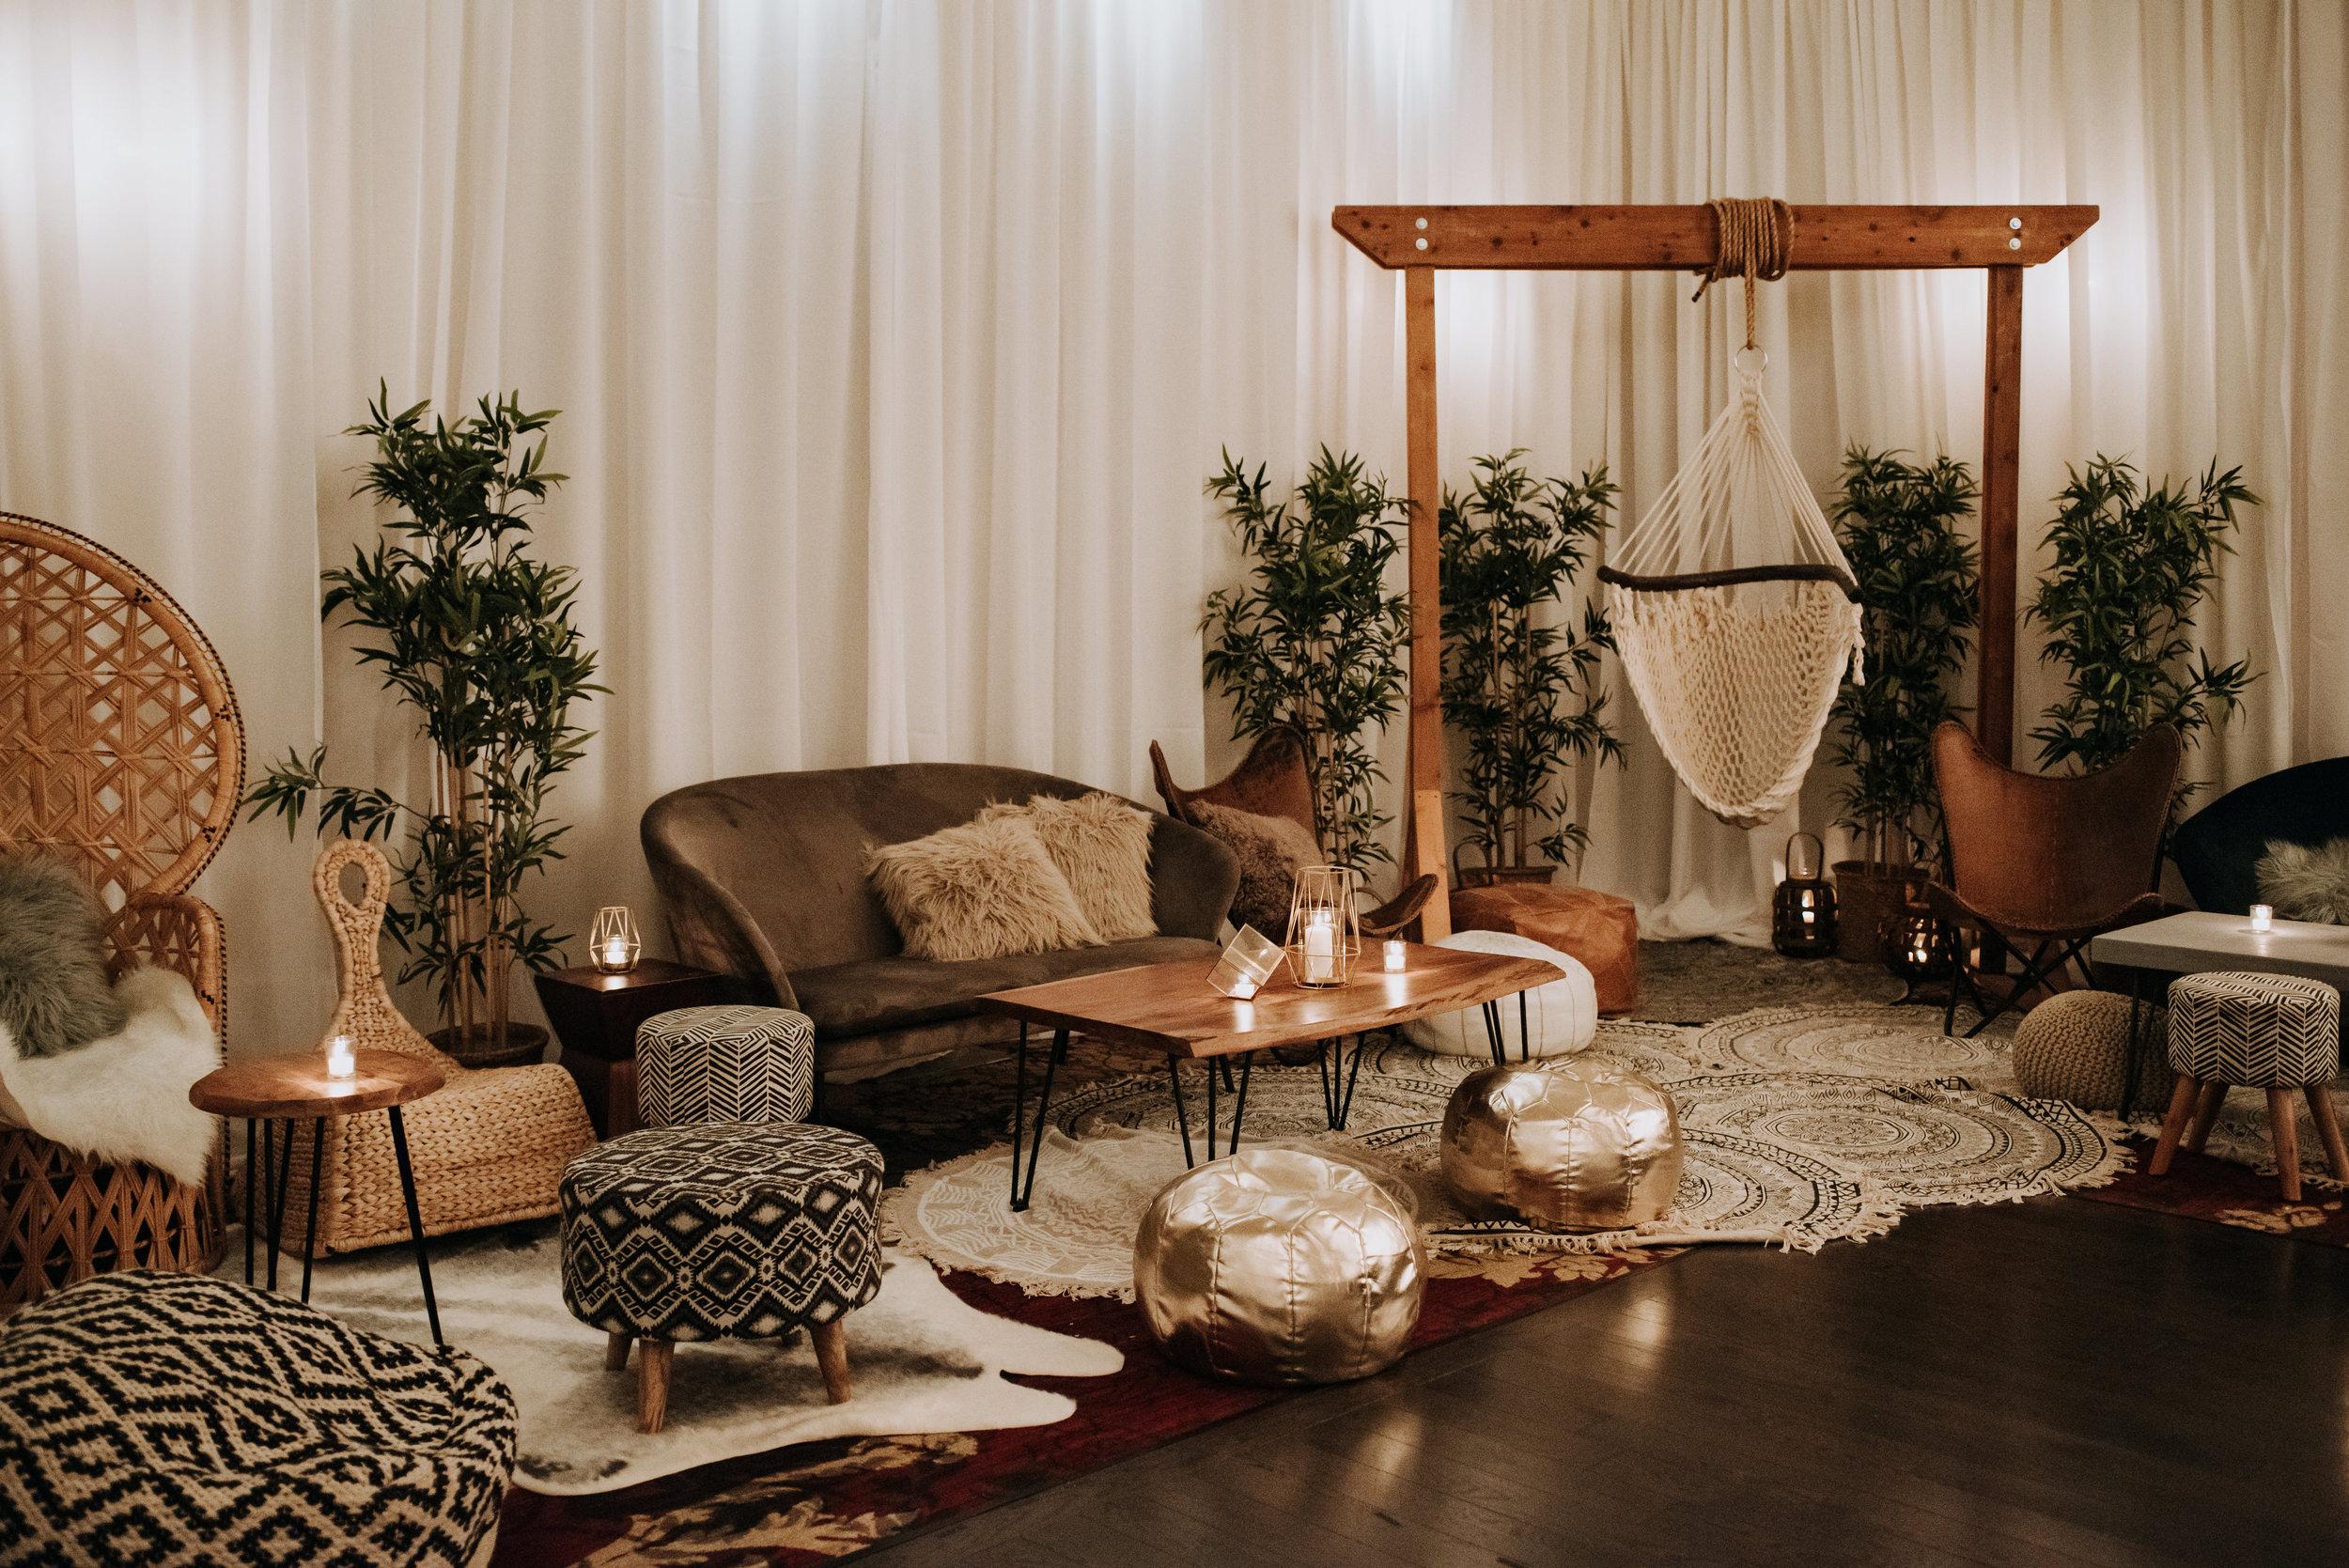 21-terminal-city-club-vancouver-new-years-wedding-rebekahjake-7250.jpg